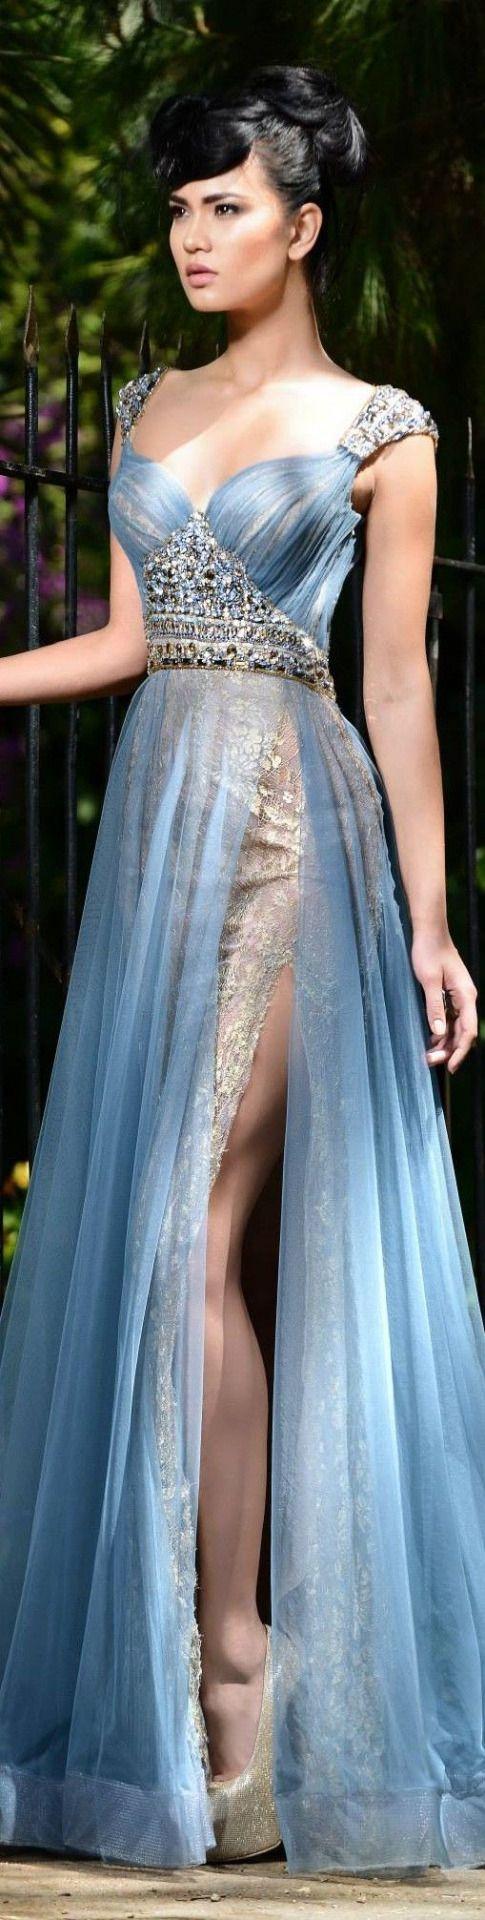 319 best ( c ) ROBES LONGUES # images on Pinterest | Long gowns ...